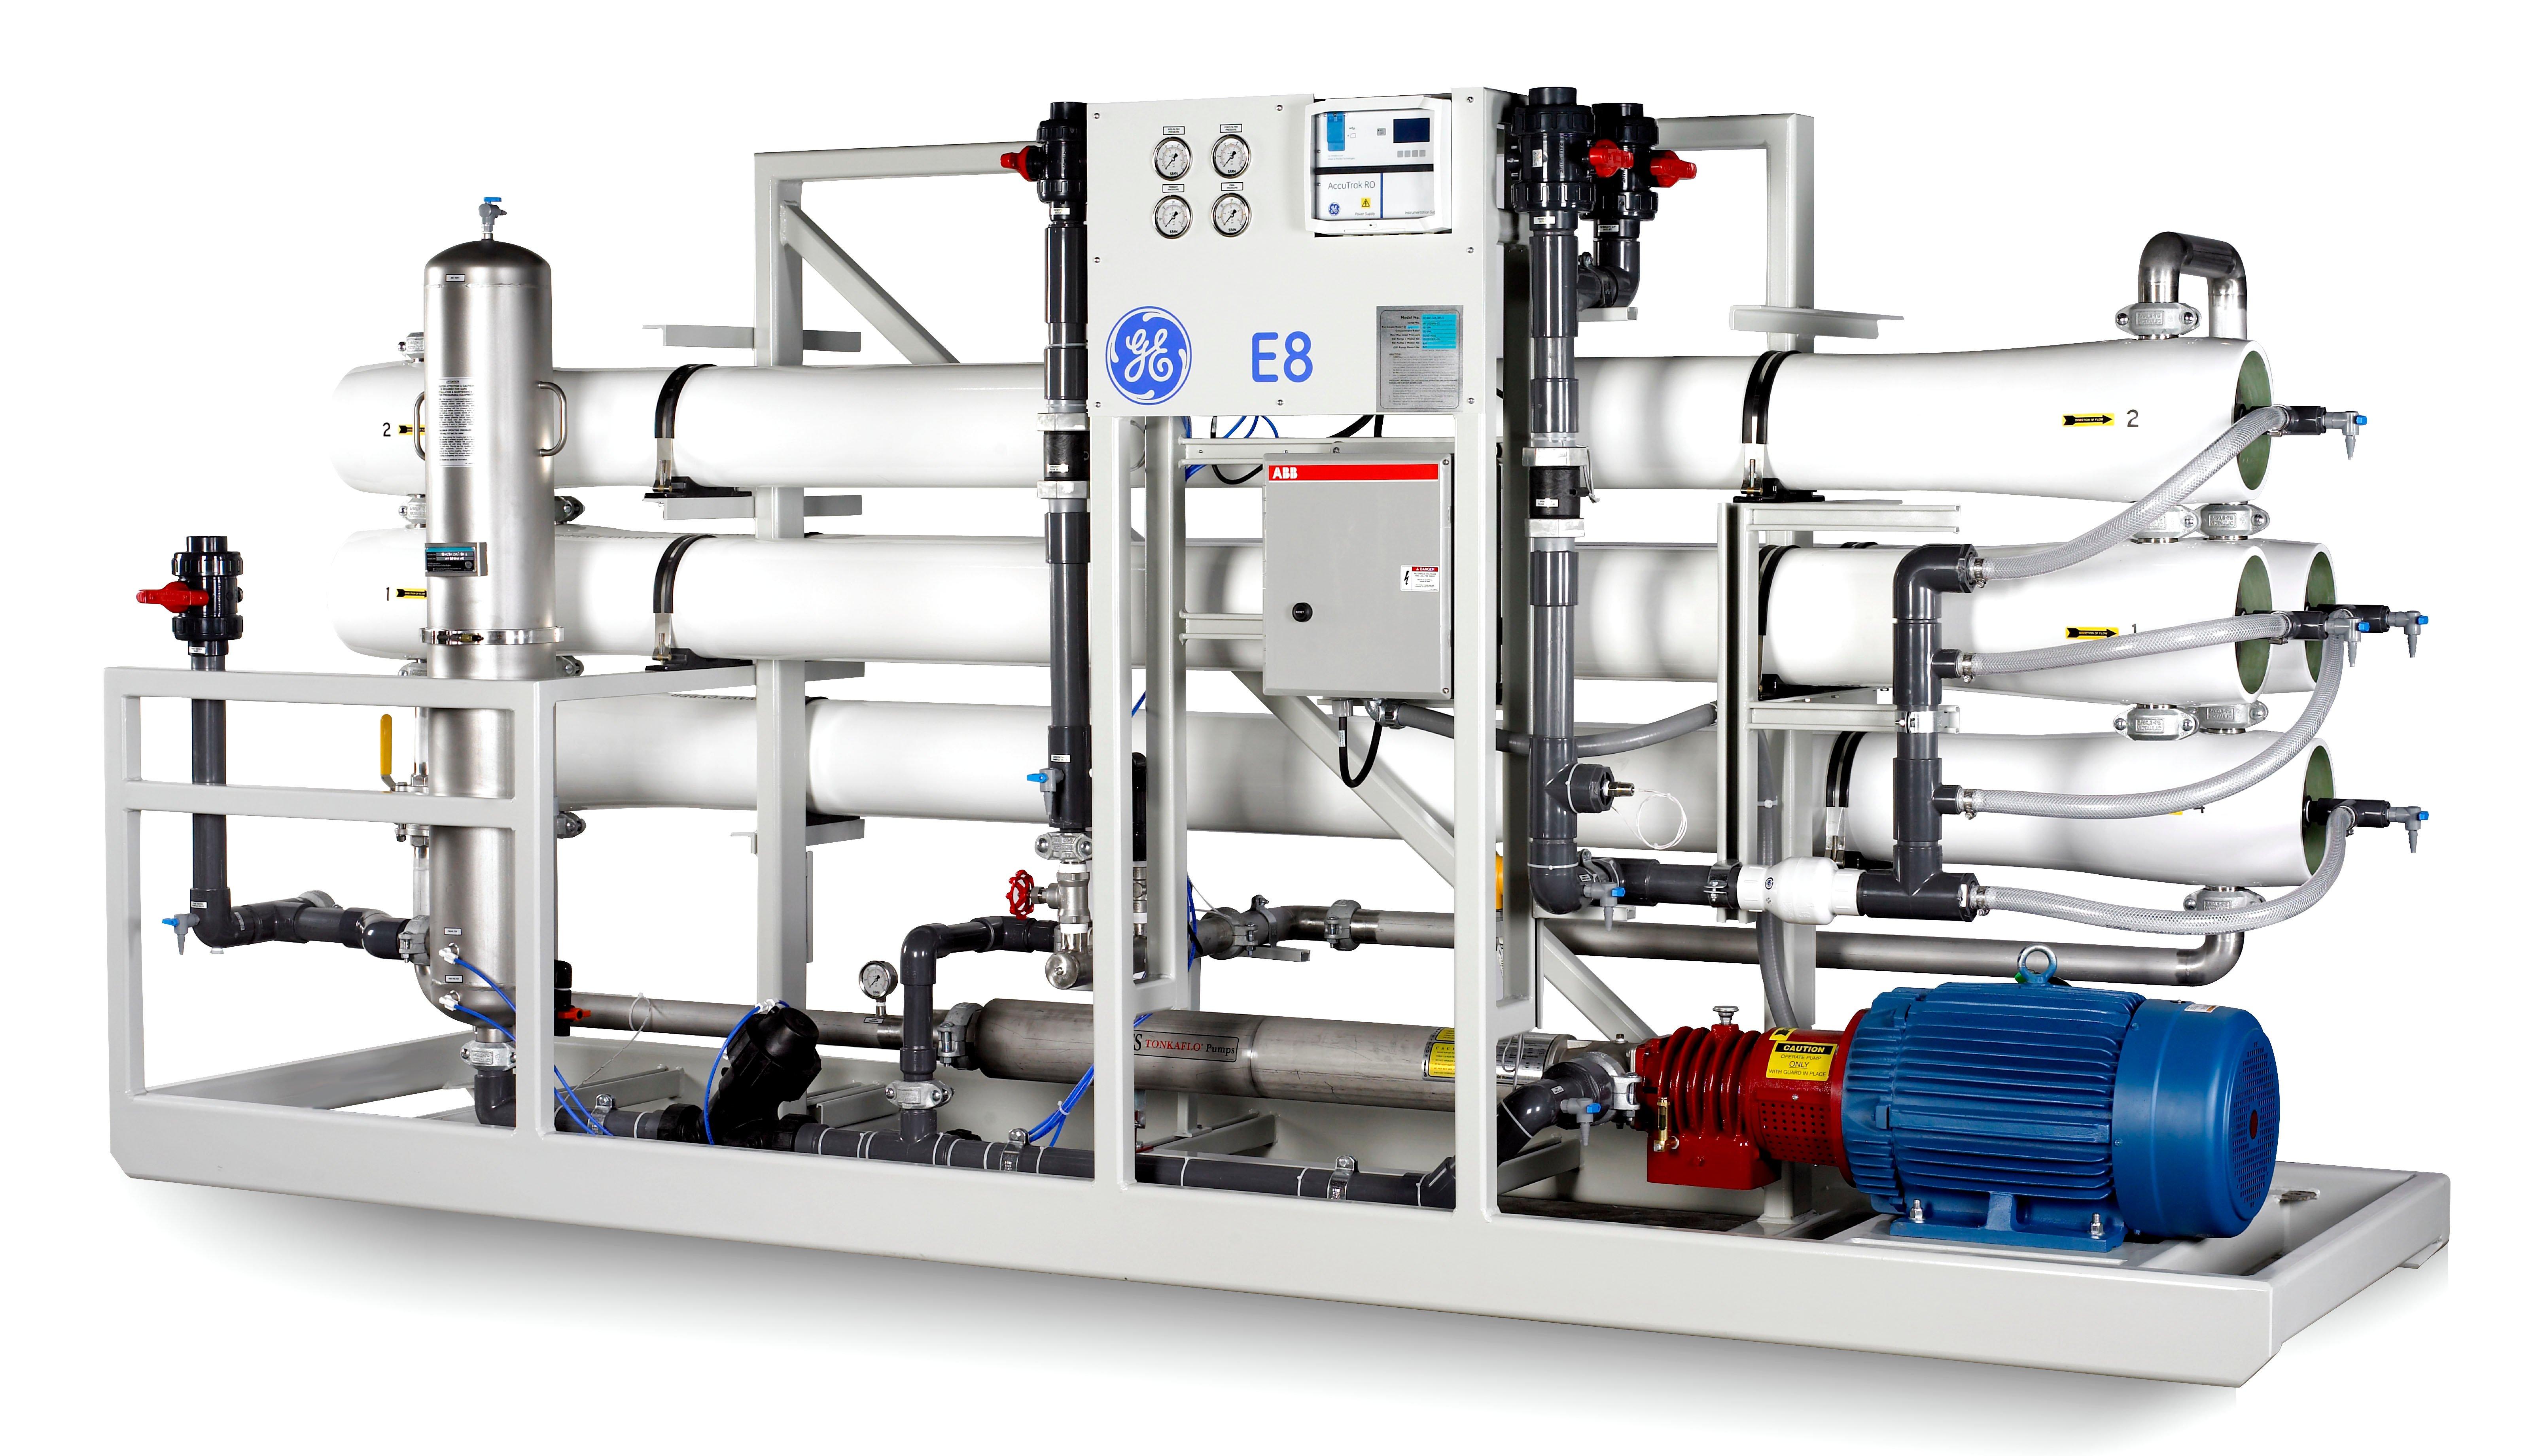 Suez E8 Reverse Osmosis RO System